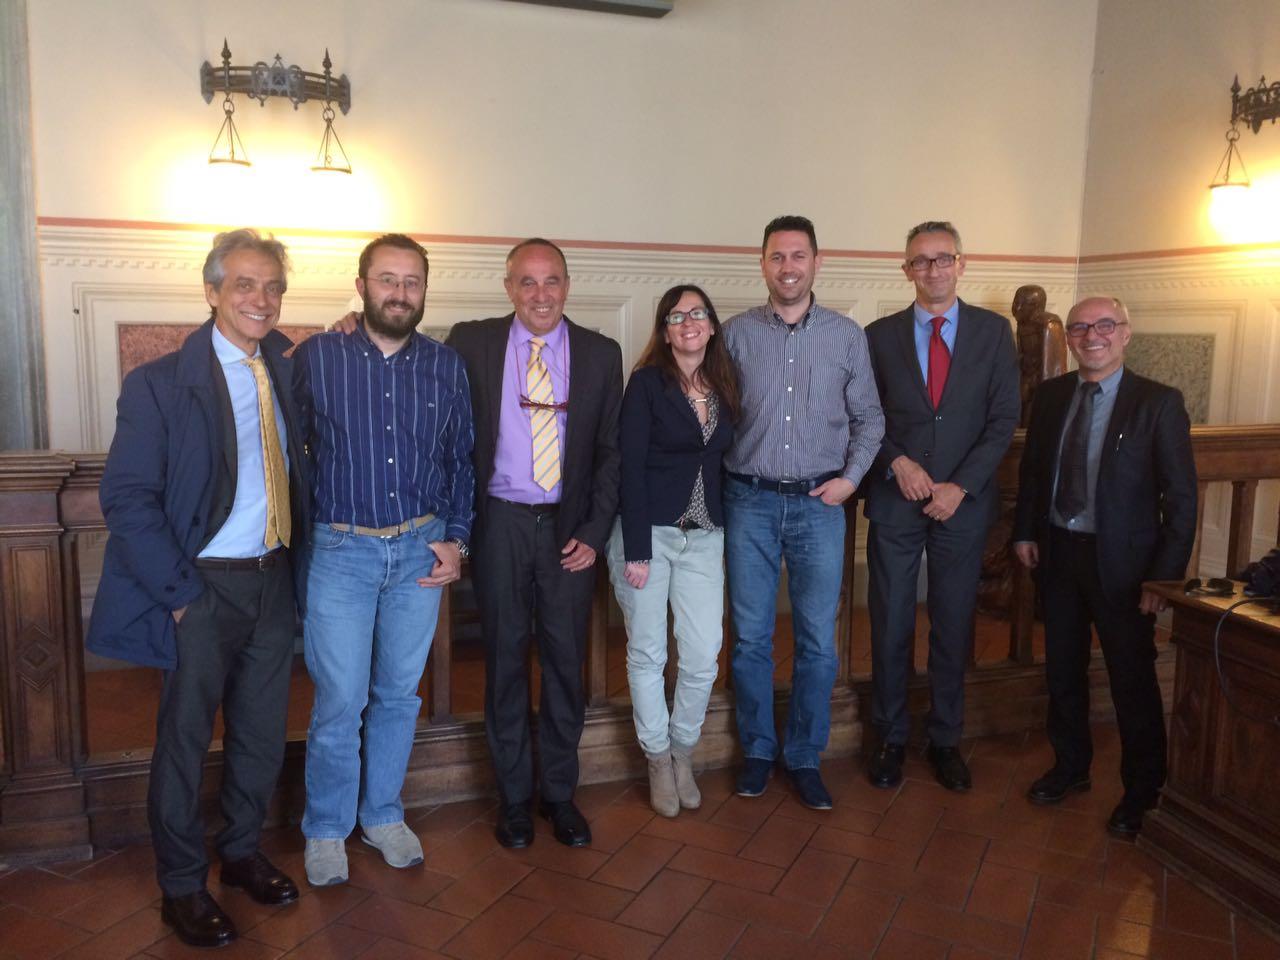 Amiata, Val d'Orcia e Valdichiana senese: avanti verso la zona socio-sanitaria unica